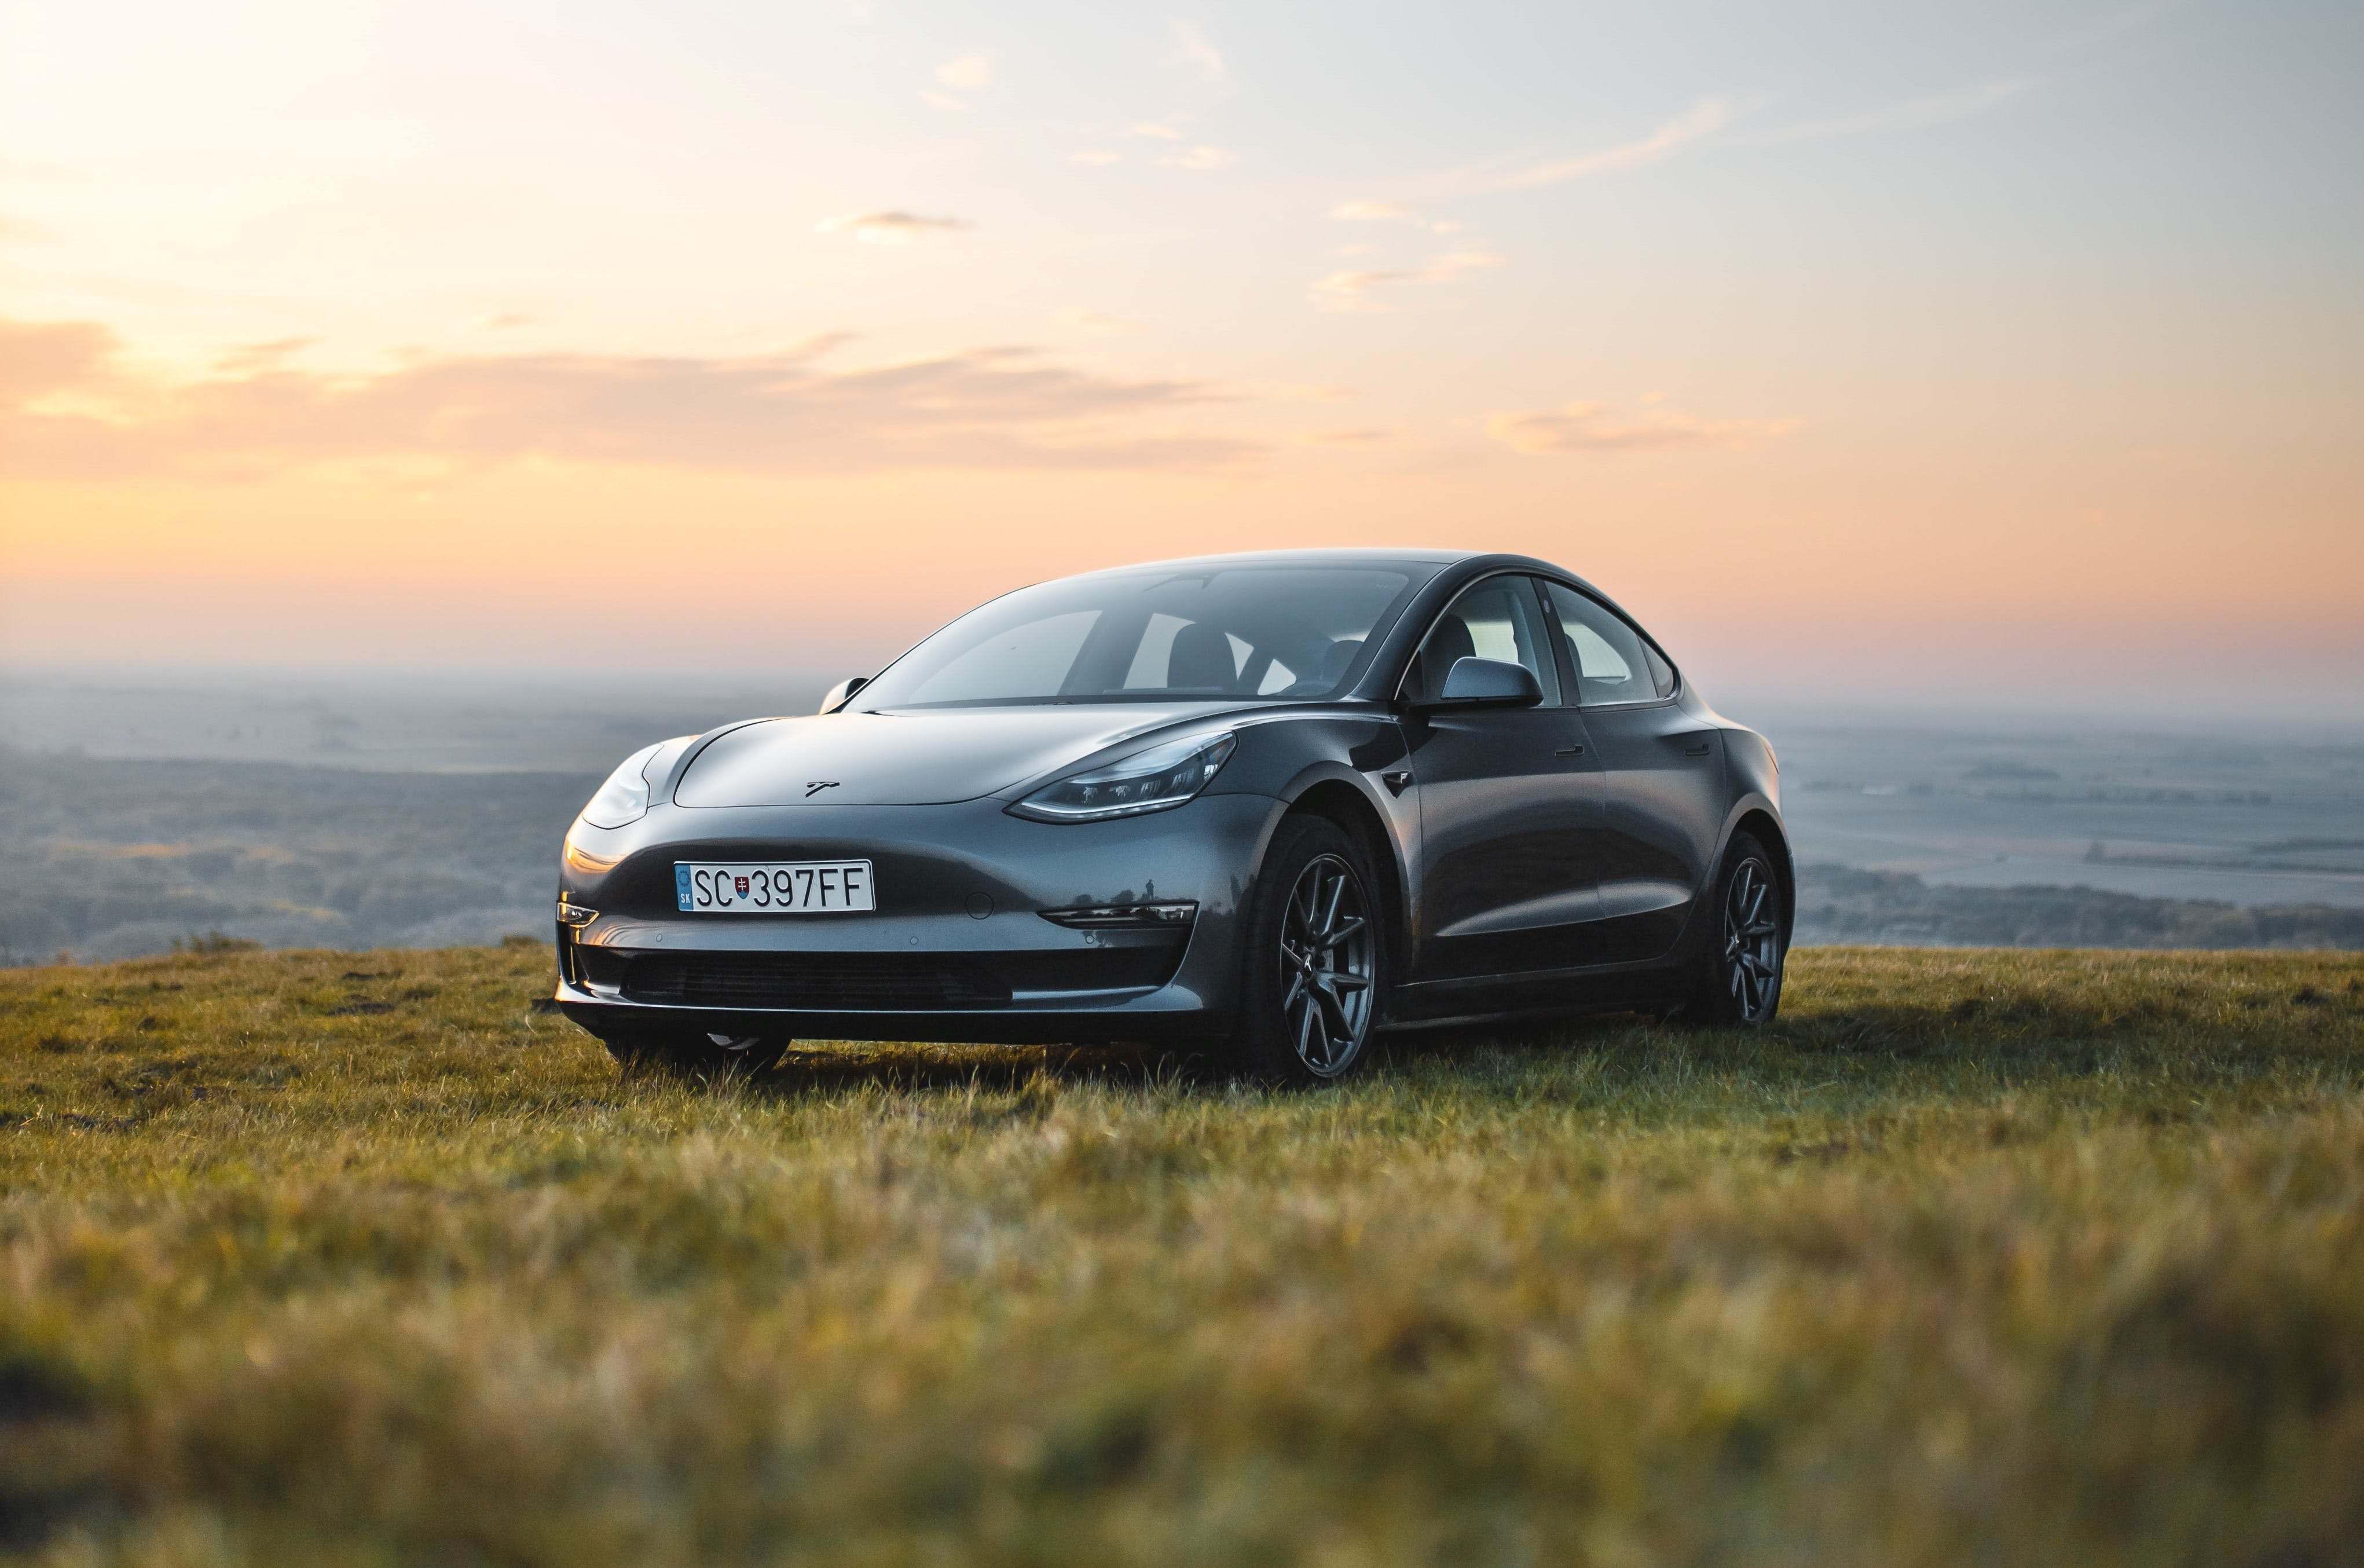 Tesla Model 3, elektrische wagen